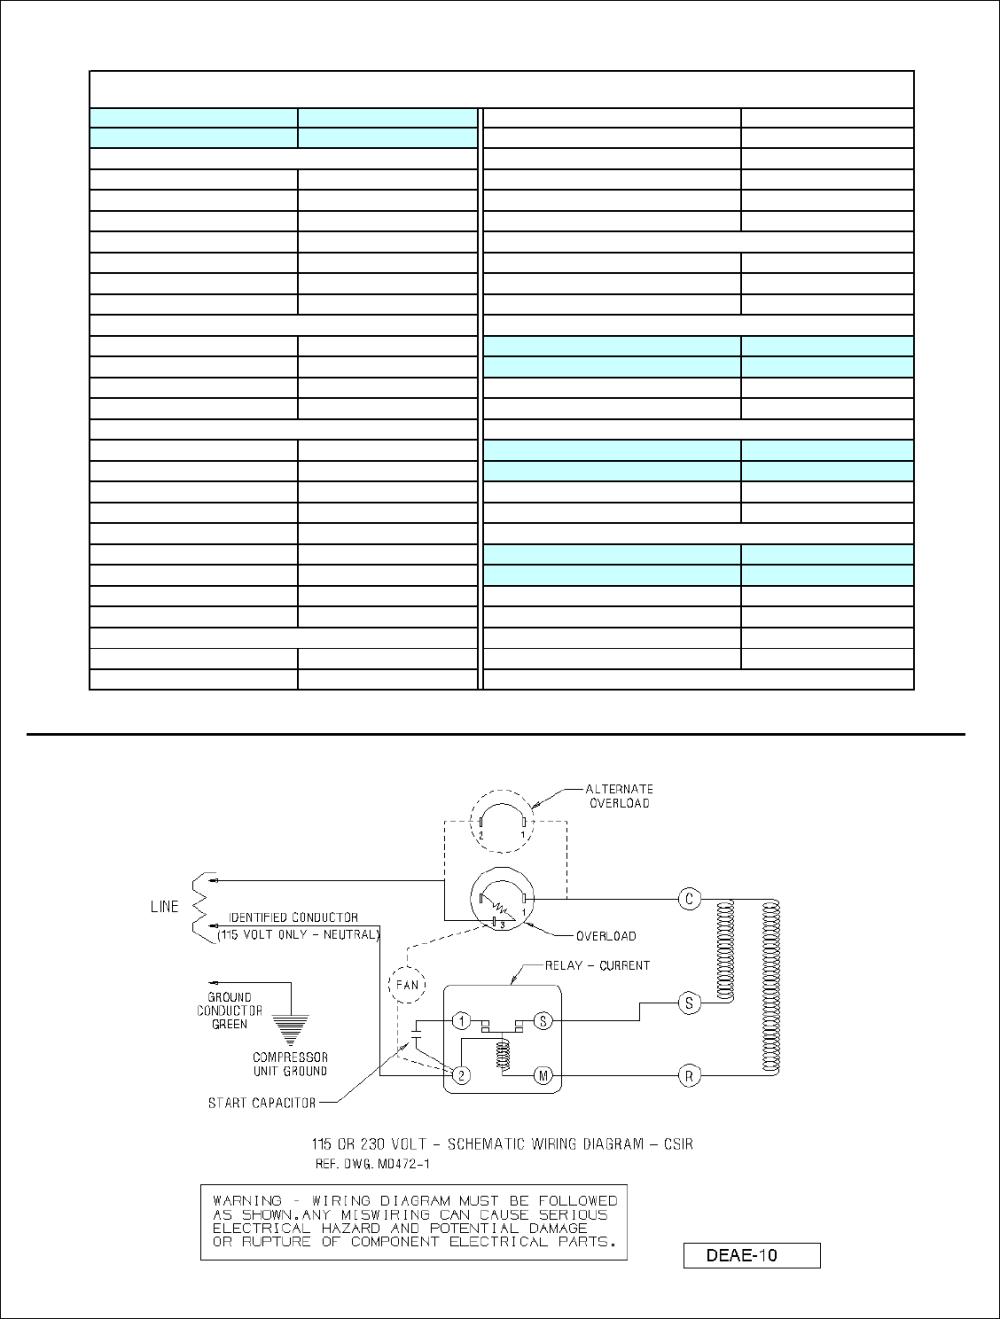 medium resolution of unit bom 33y324 2 fan motor 810l009b96